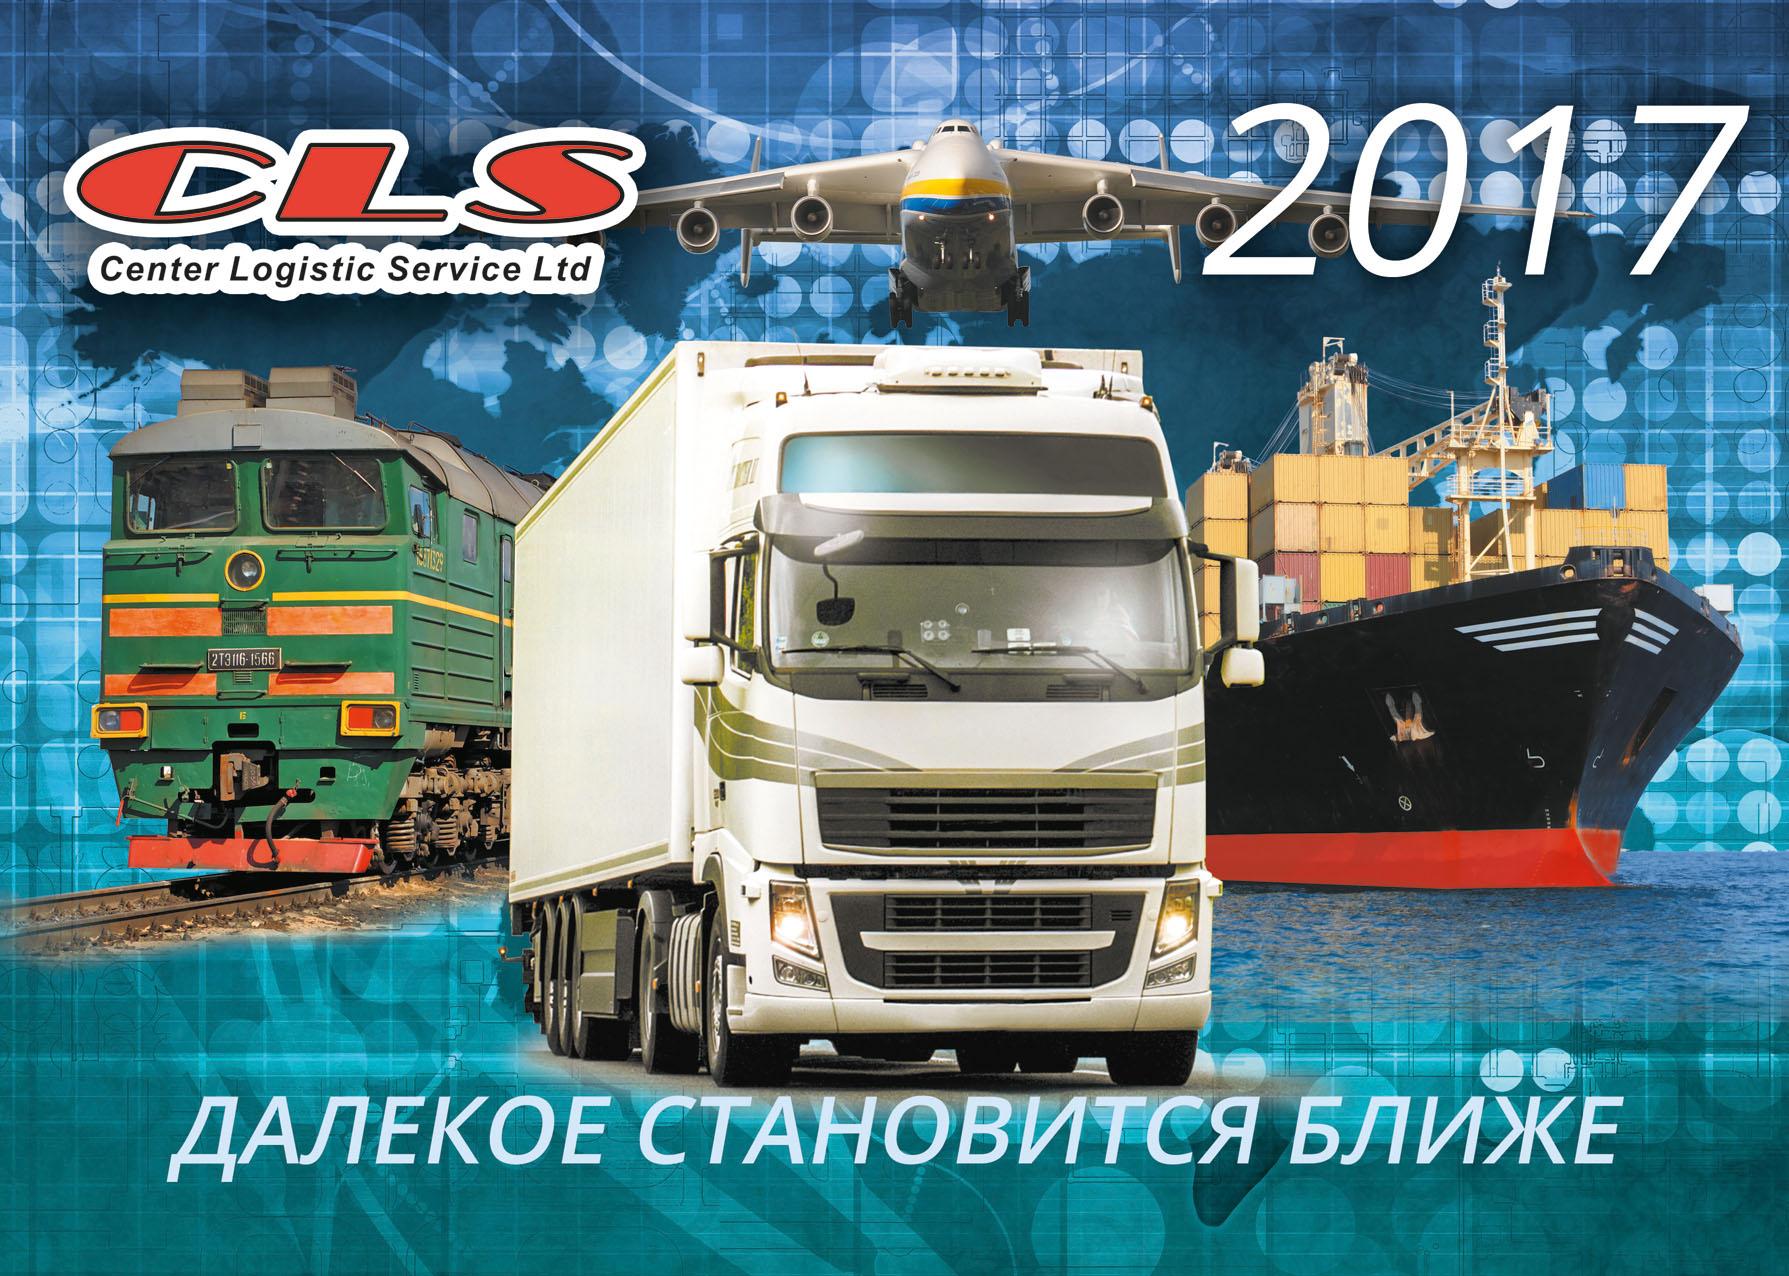 (01) Календ  логисты CLS 2017 Shapka 01